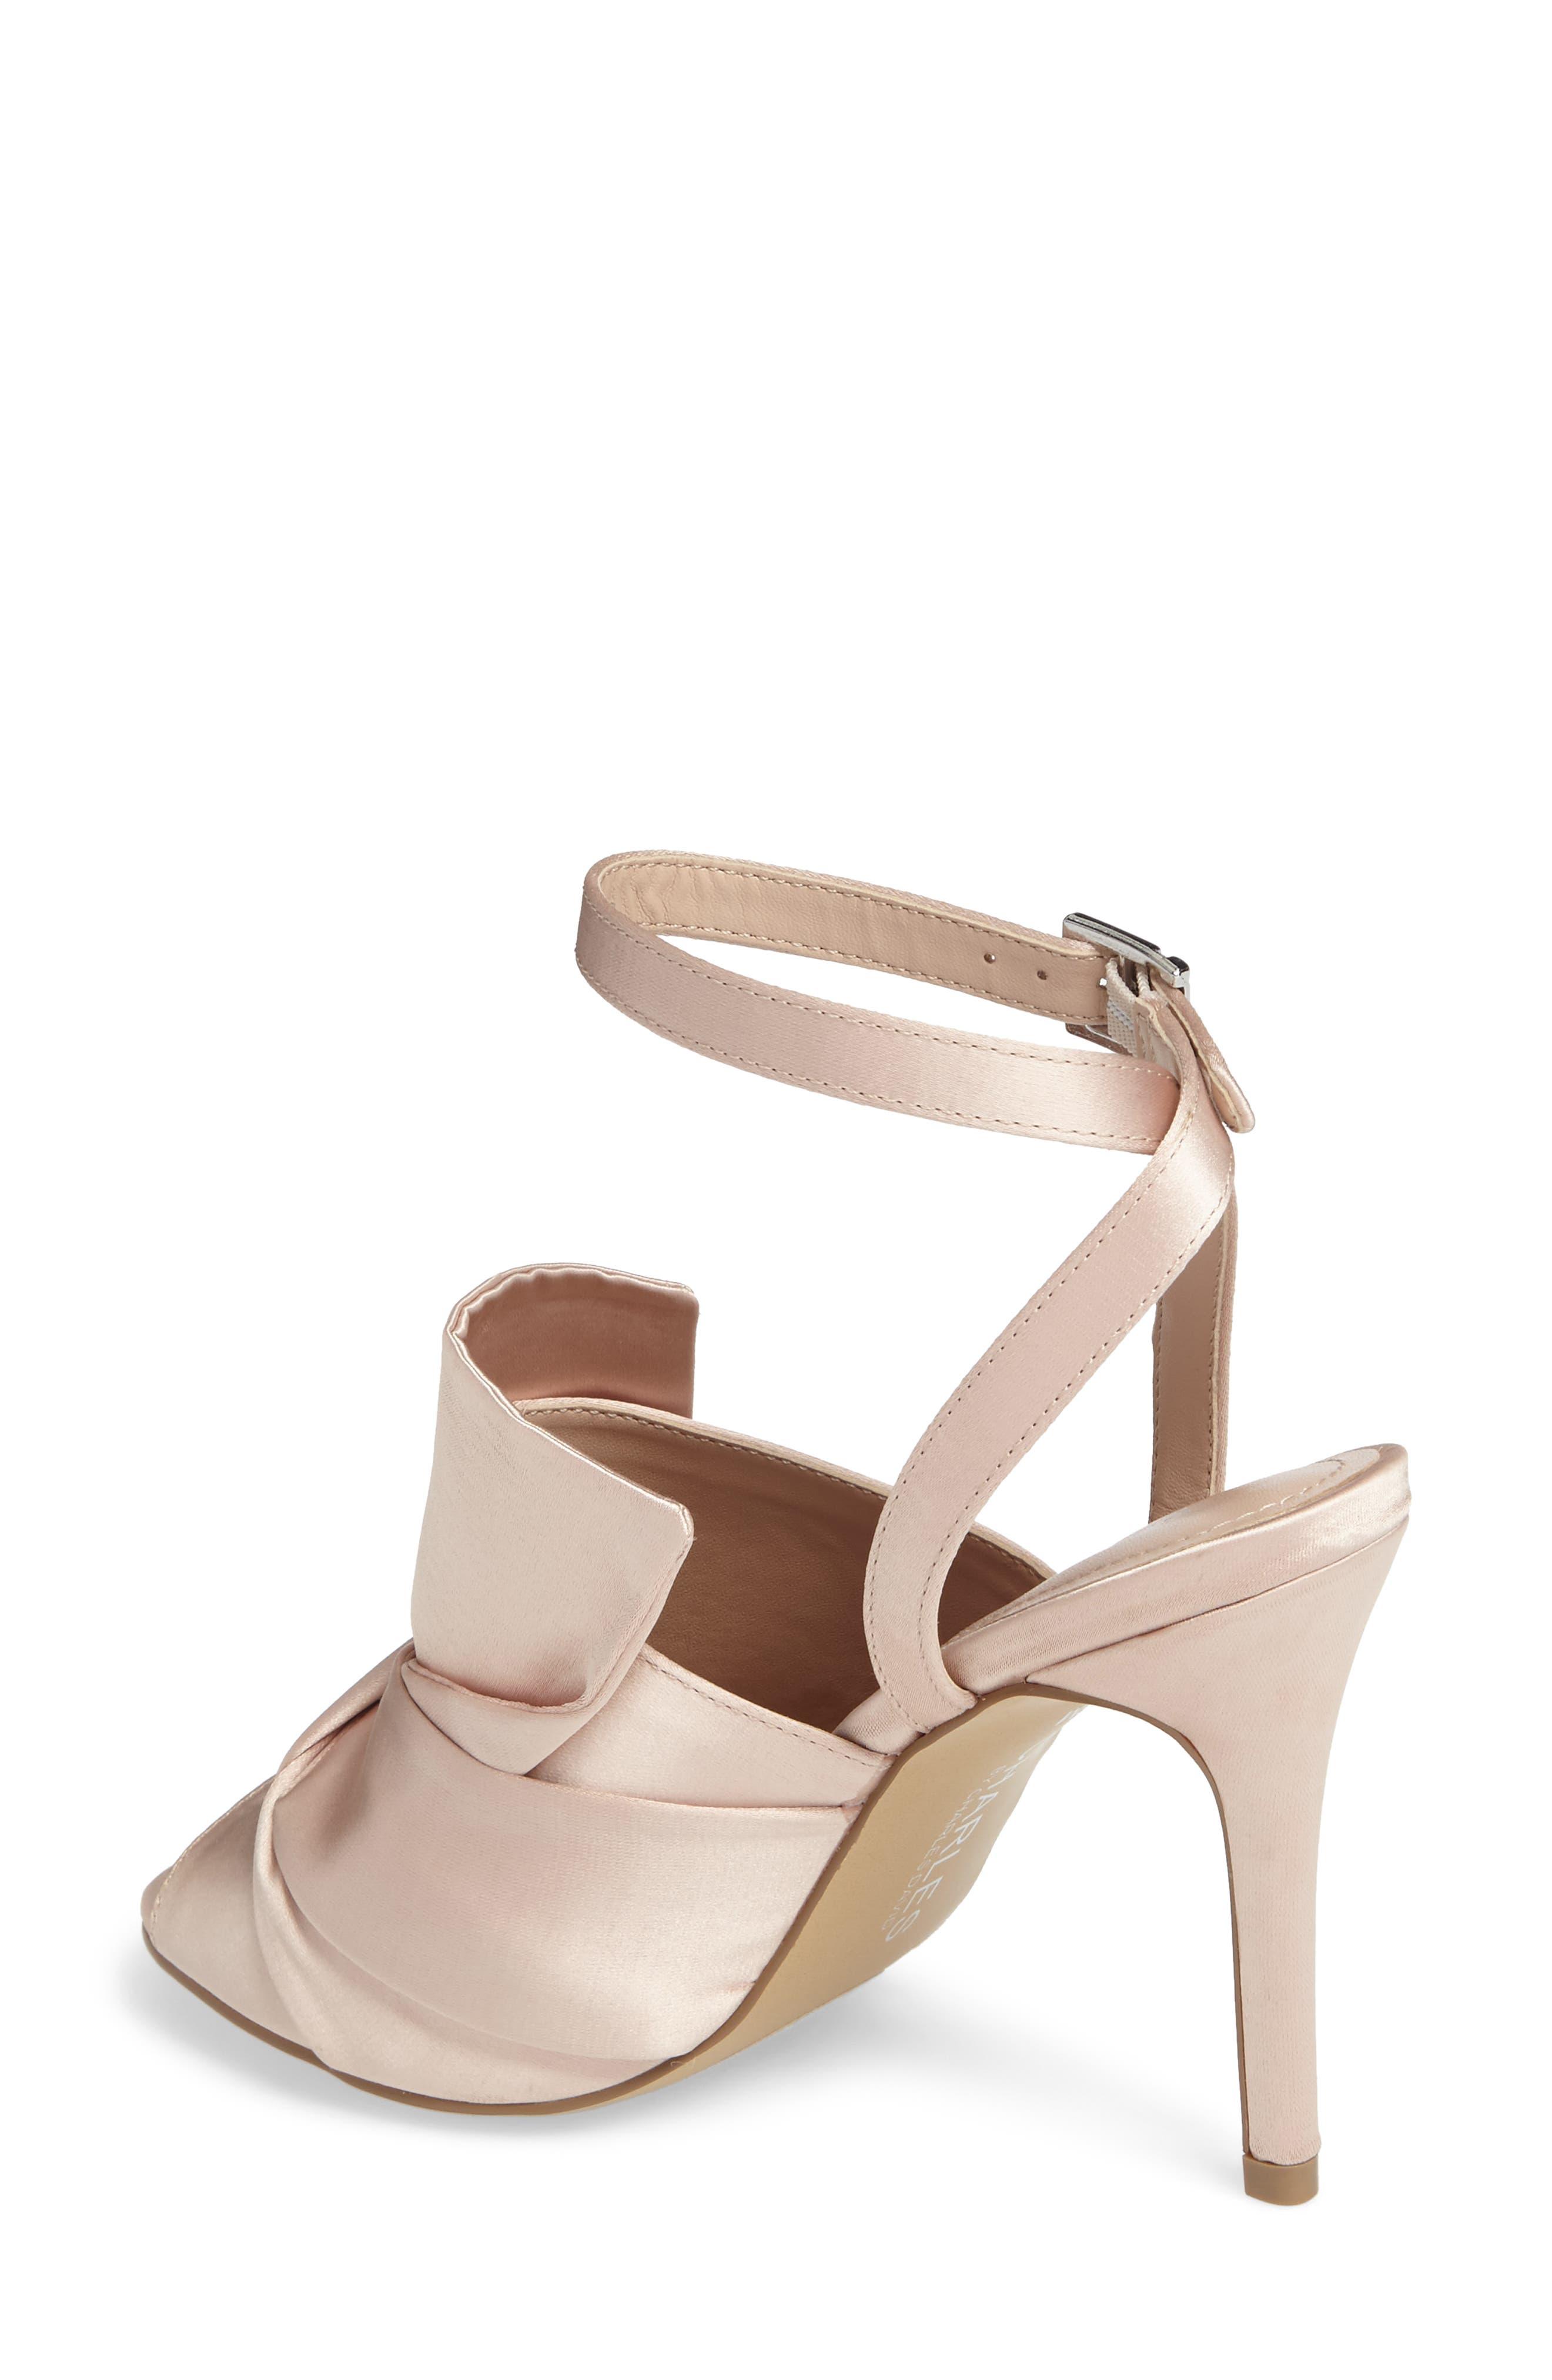 Rachel Ankle Strap Sandal,                             Alternate thumbnail 5, color,